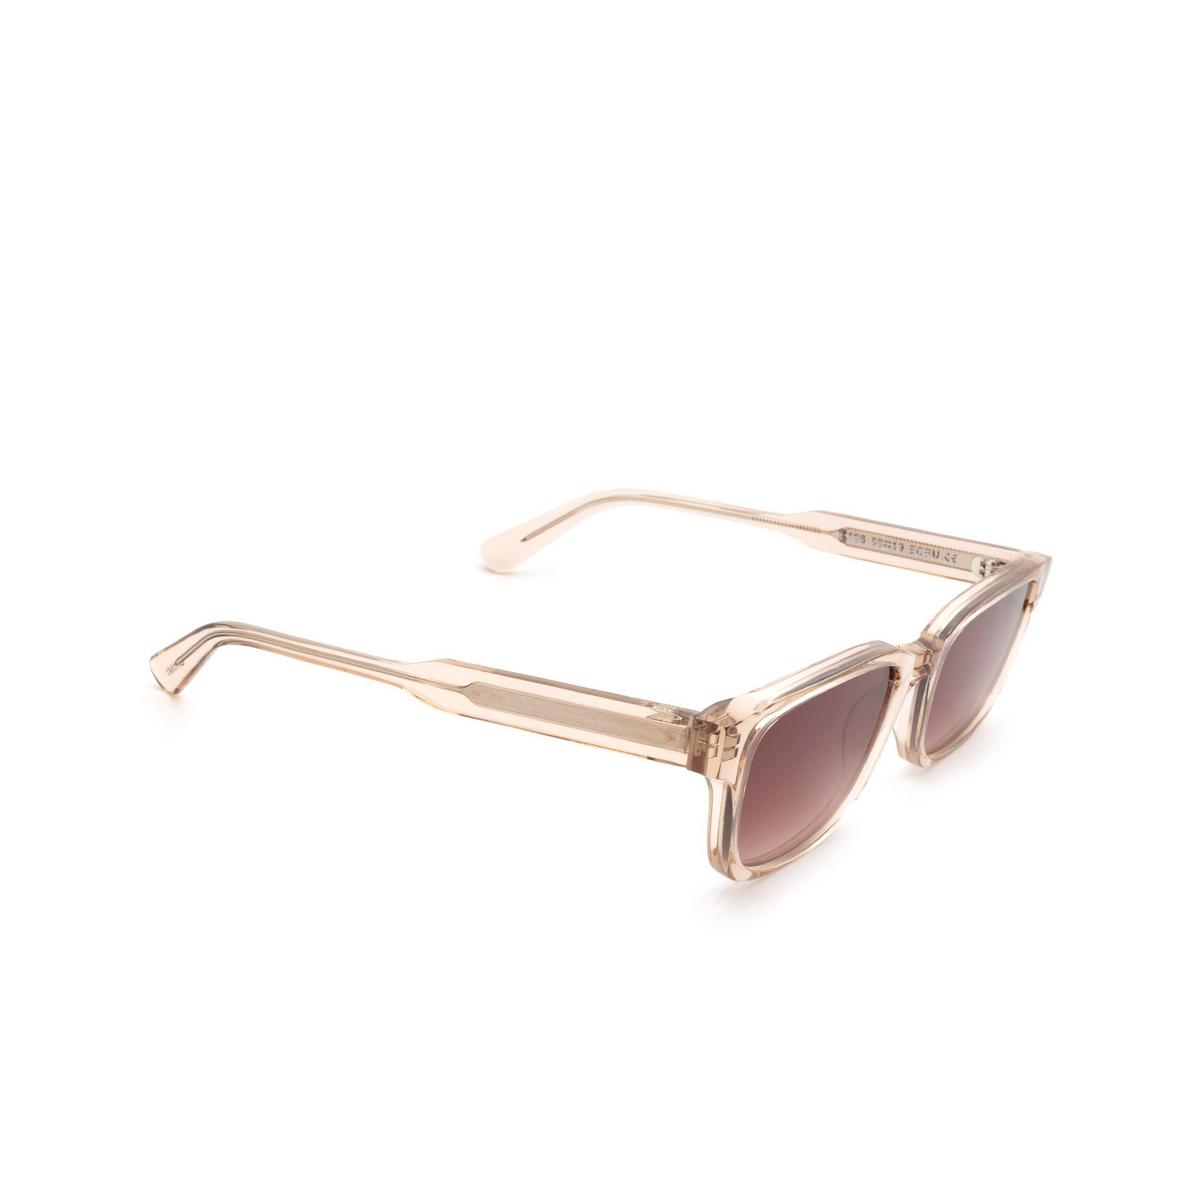 Chimi® Rectangle Sunglasses: #106 color Light Beige Ecru - three-quarters view.